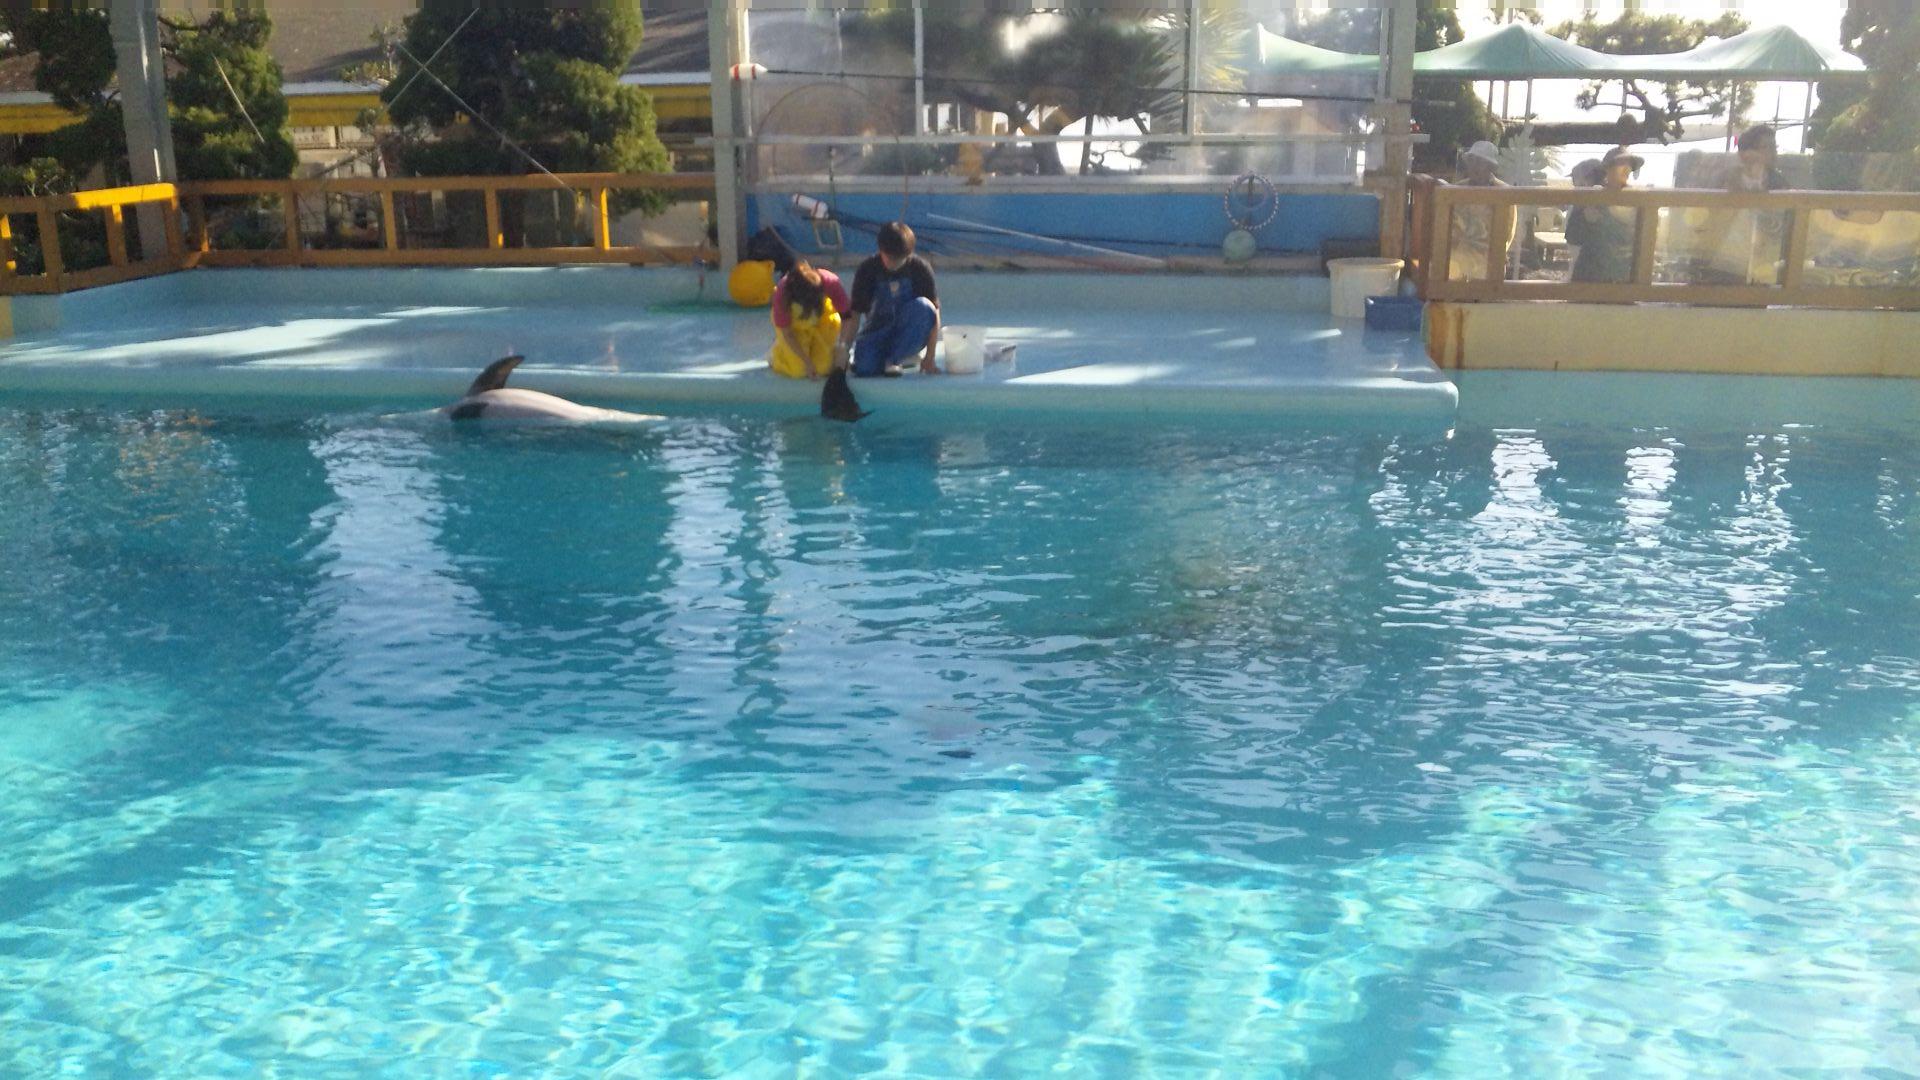 Nov-24-2009-image20090966.jpg